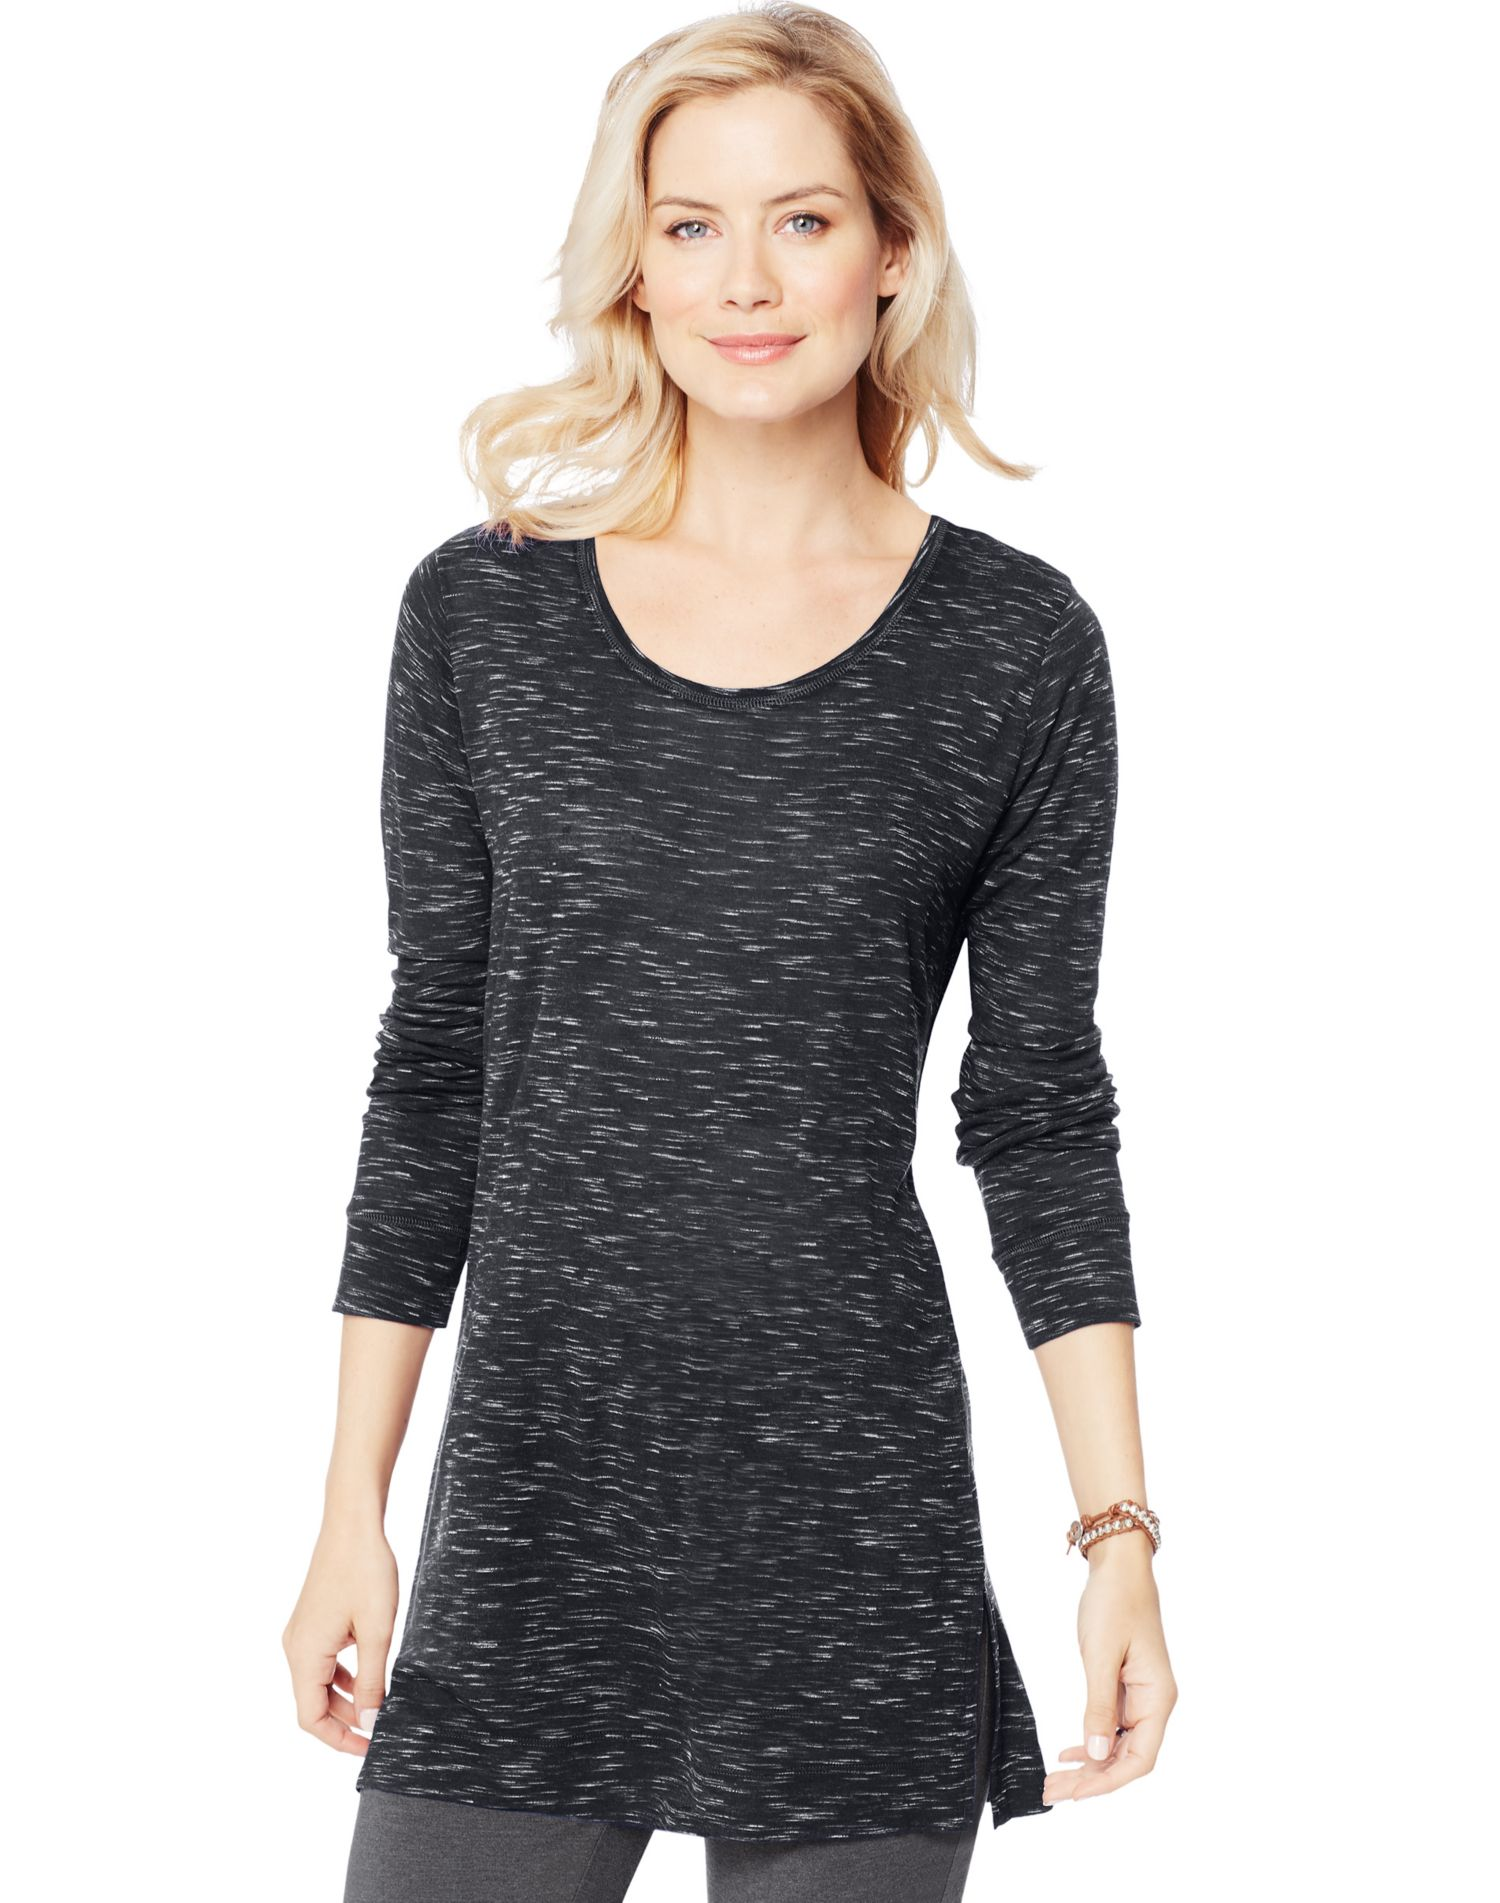 Hanes women s essentials lightweight space dye vented tunic for Lightweight long sleeve shirts women s